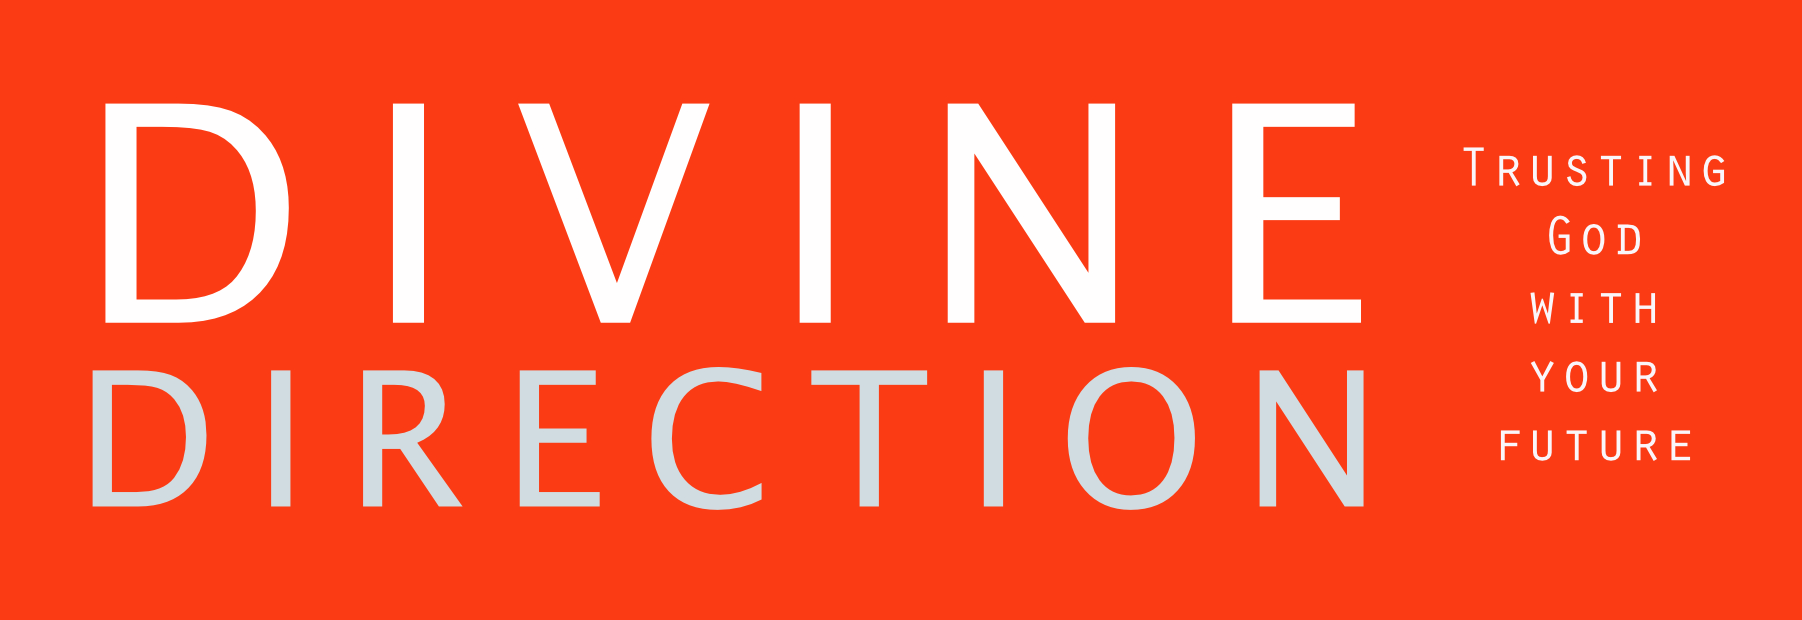 Divine direction webbanner tagline with NO DATE.jpg